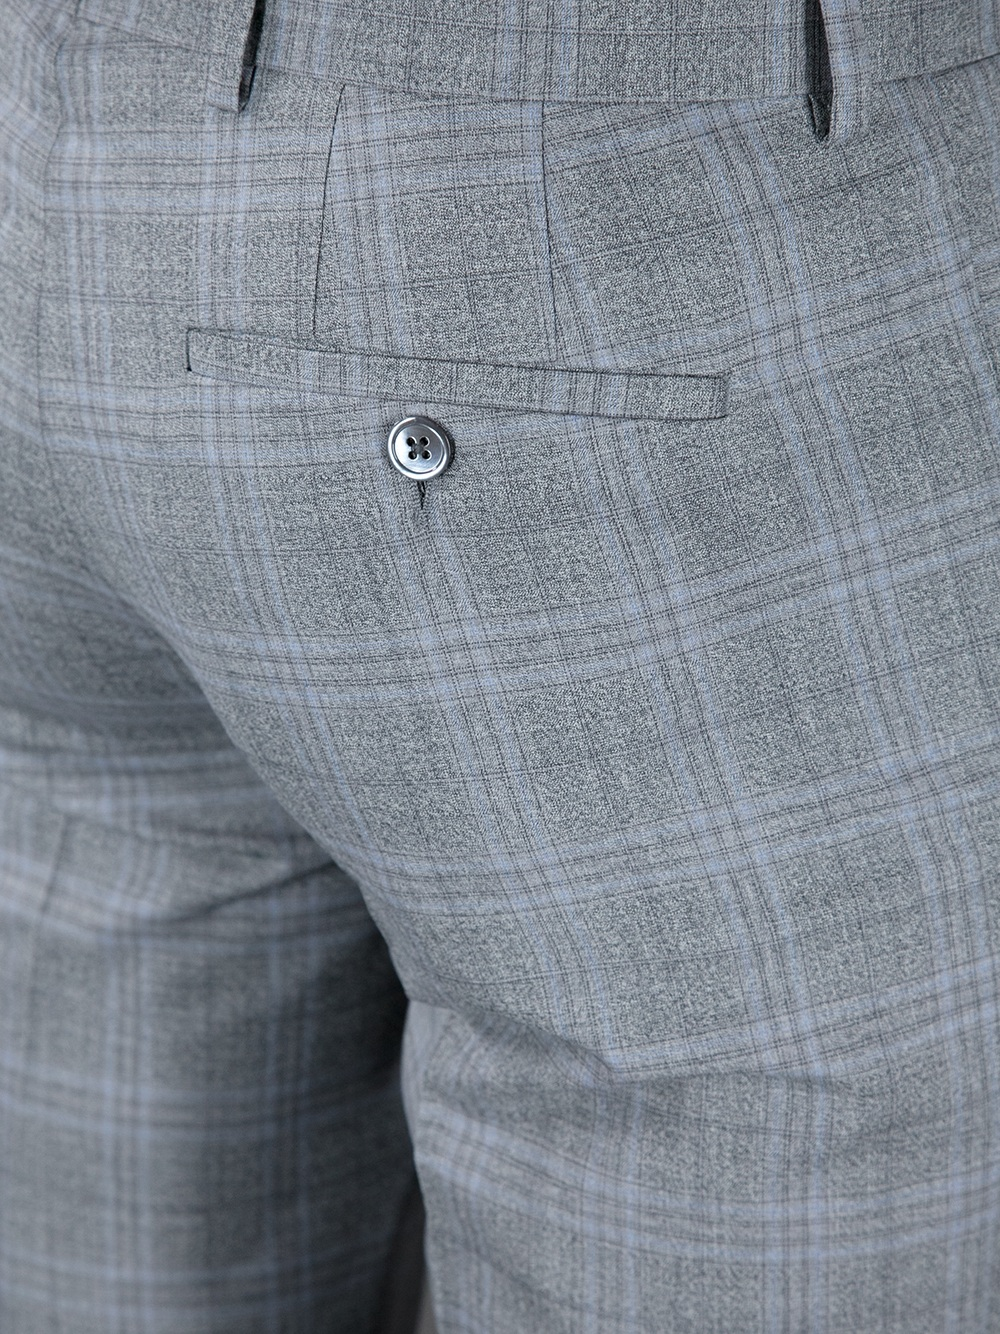 Lyst - Paul Smith Kensington Suit in Gray for Men